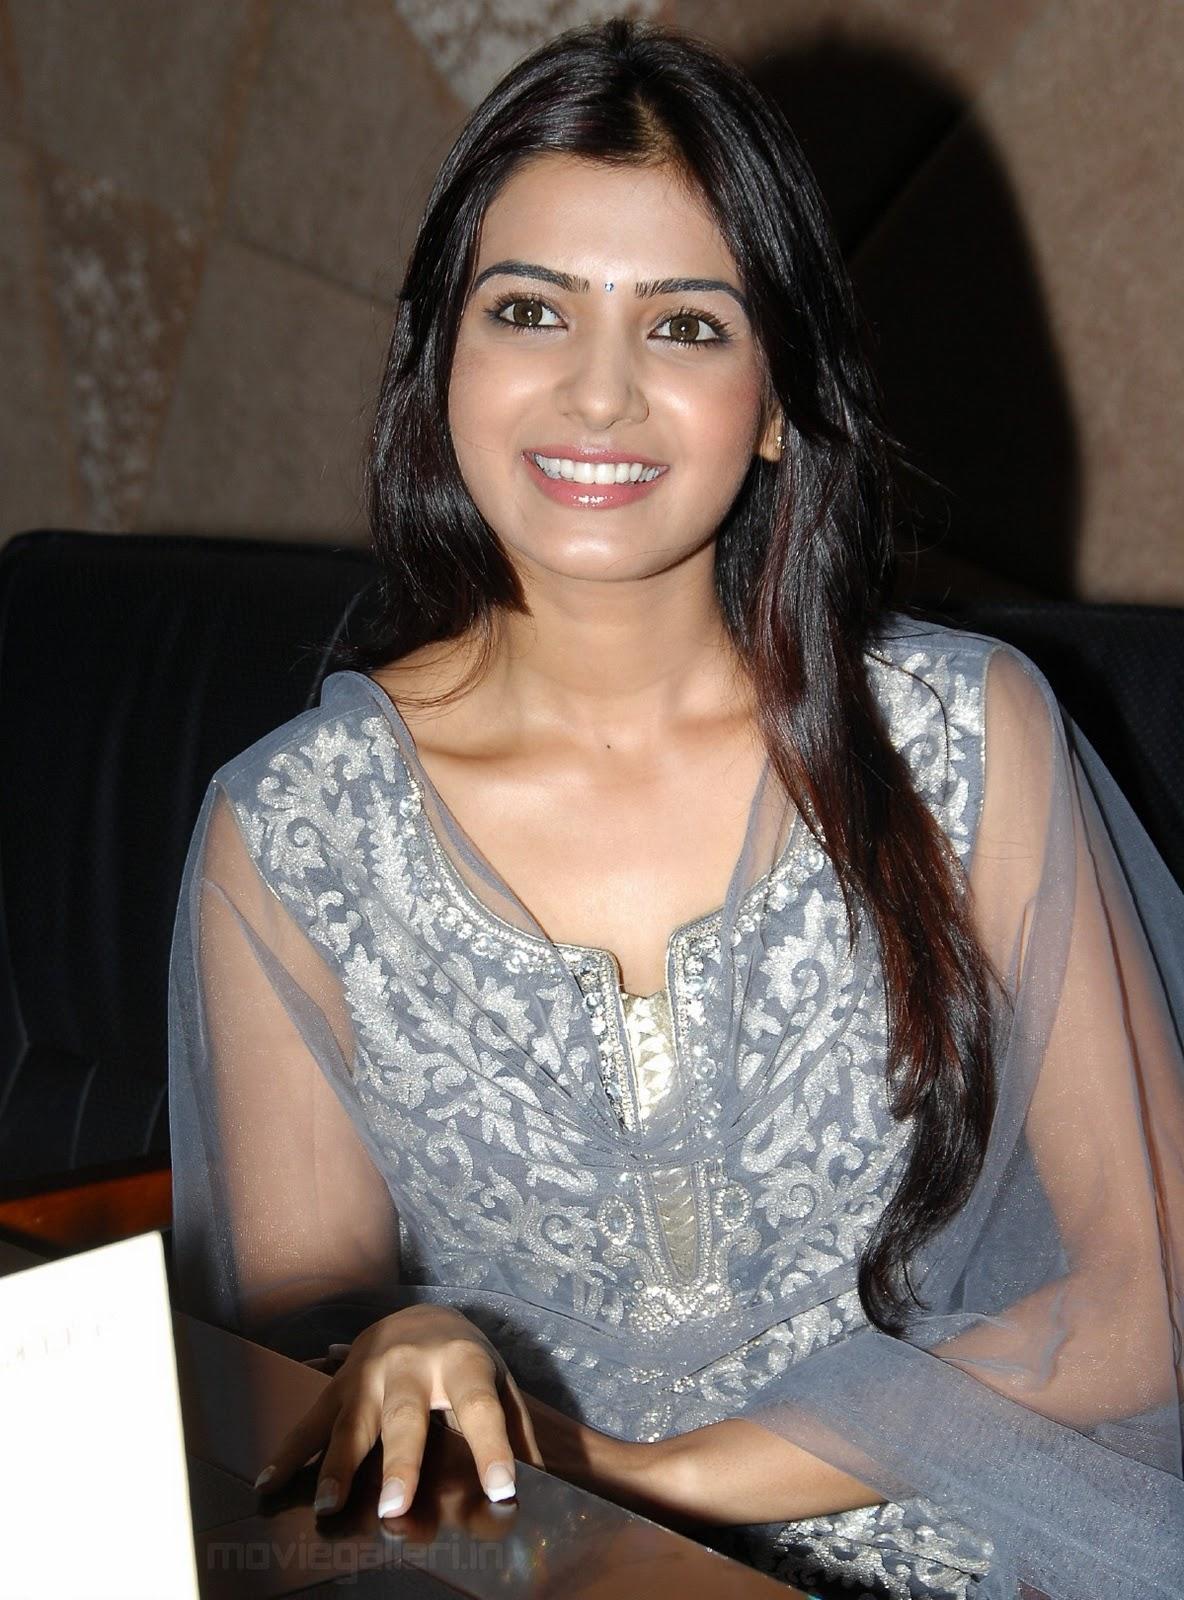 http://1.bp.blogspot.com/_eewr1b1LpYA/TMO81iBTSfI/AAAAAAAAJ2A/Mng2uwz2ReQ/s1600/actress_samantha_cute_smile_stills_wallpapers_09.jpg